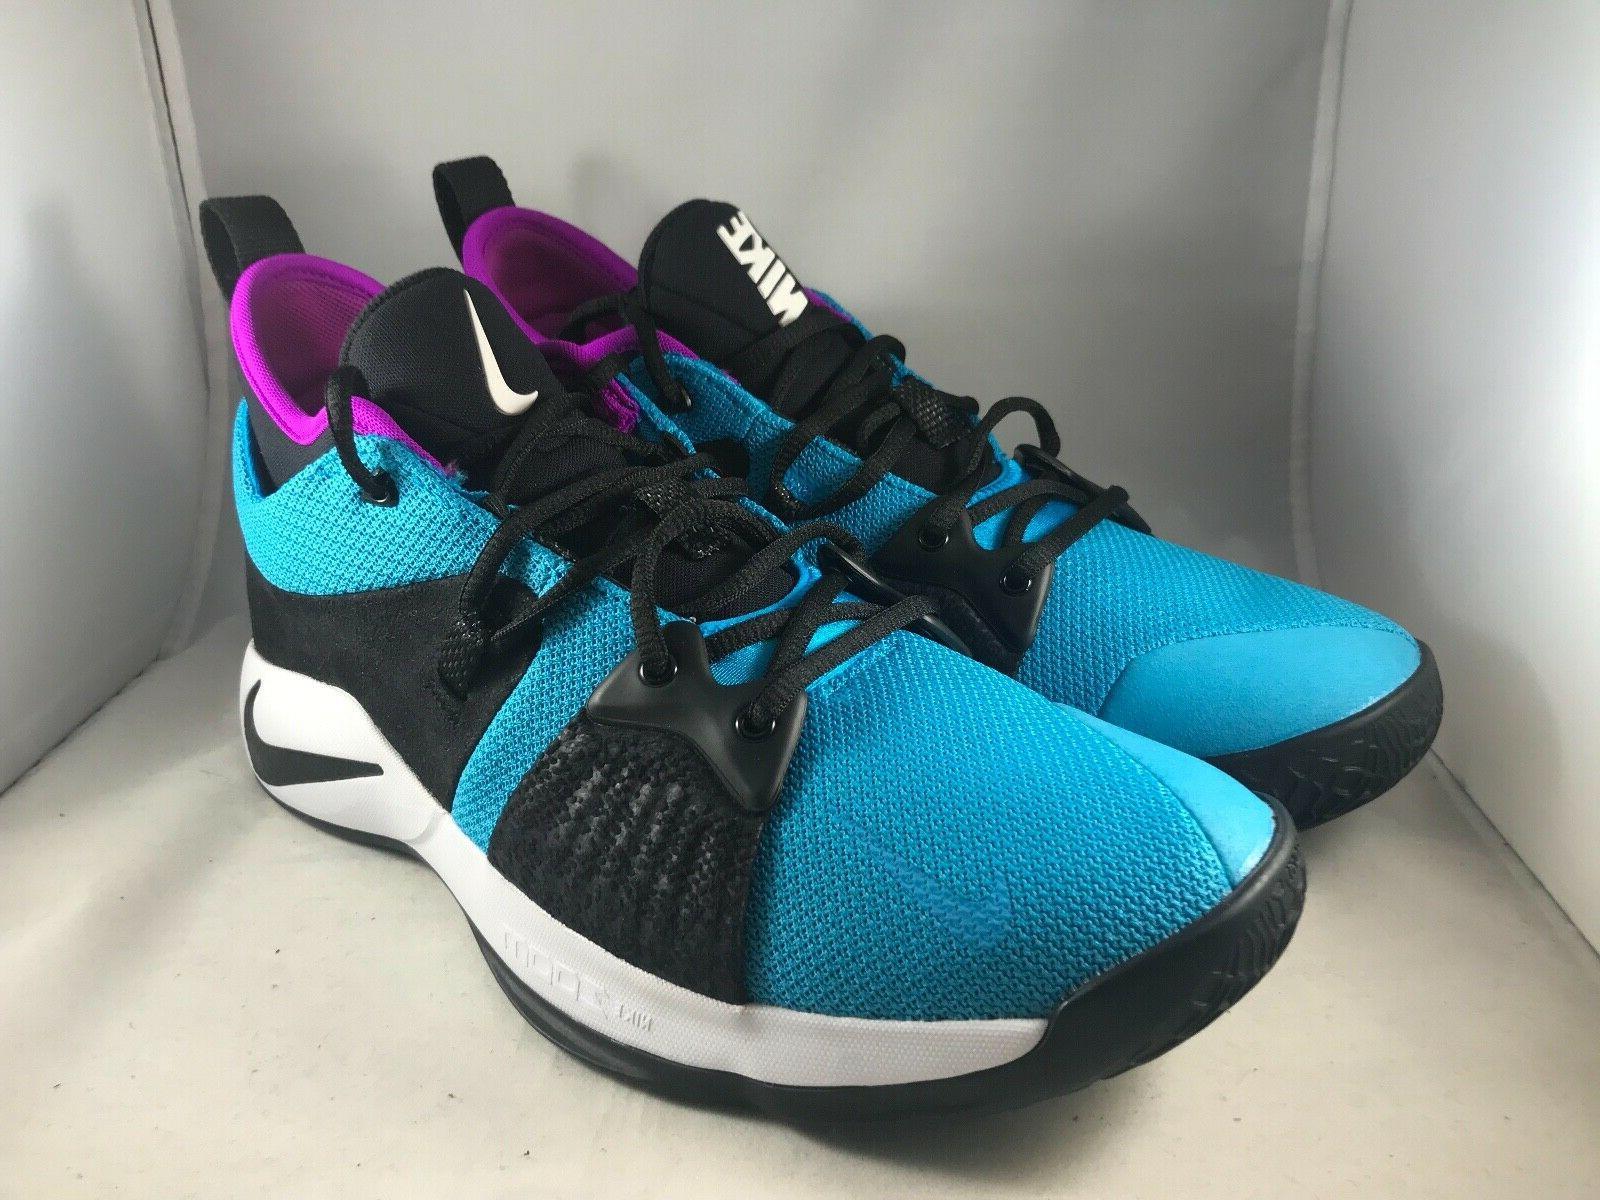 Nike PG 2 Blue Lagoon Size